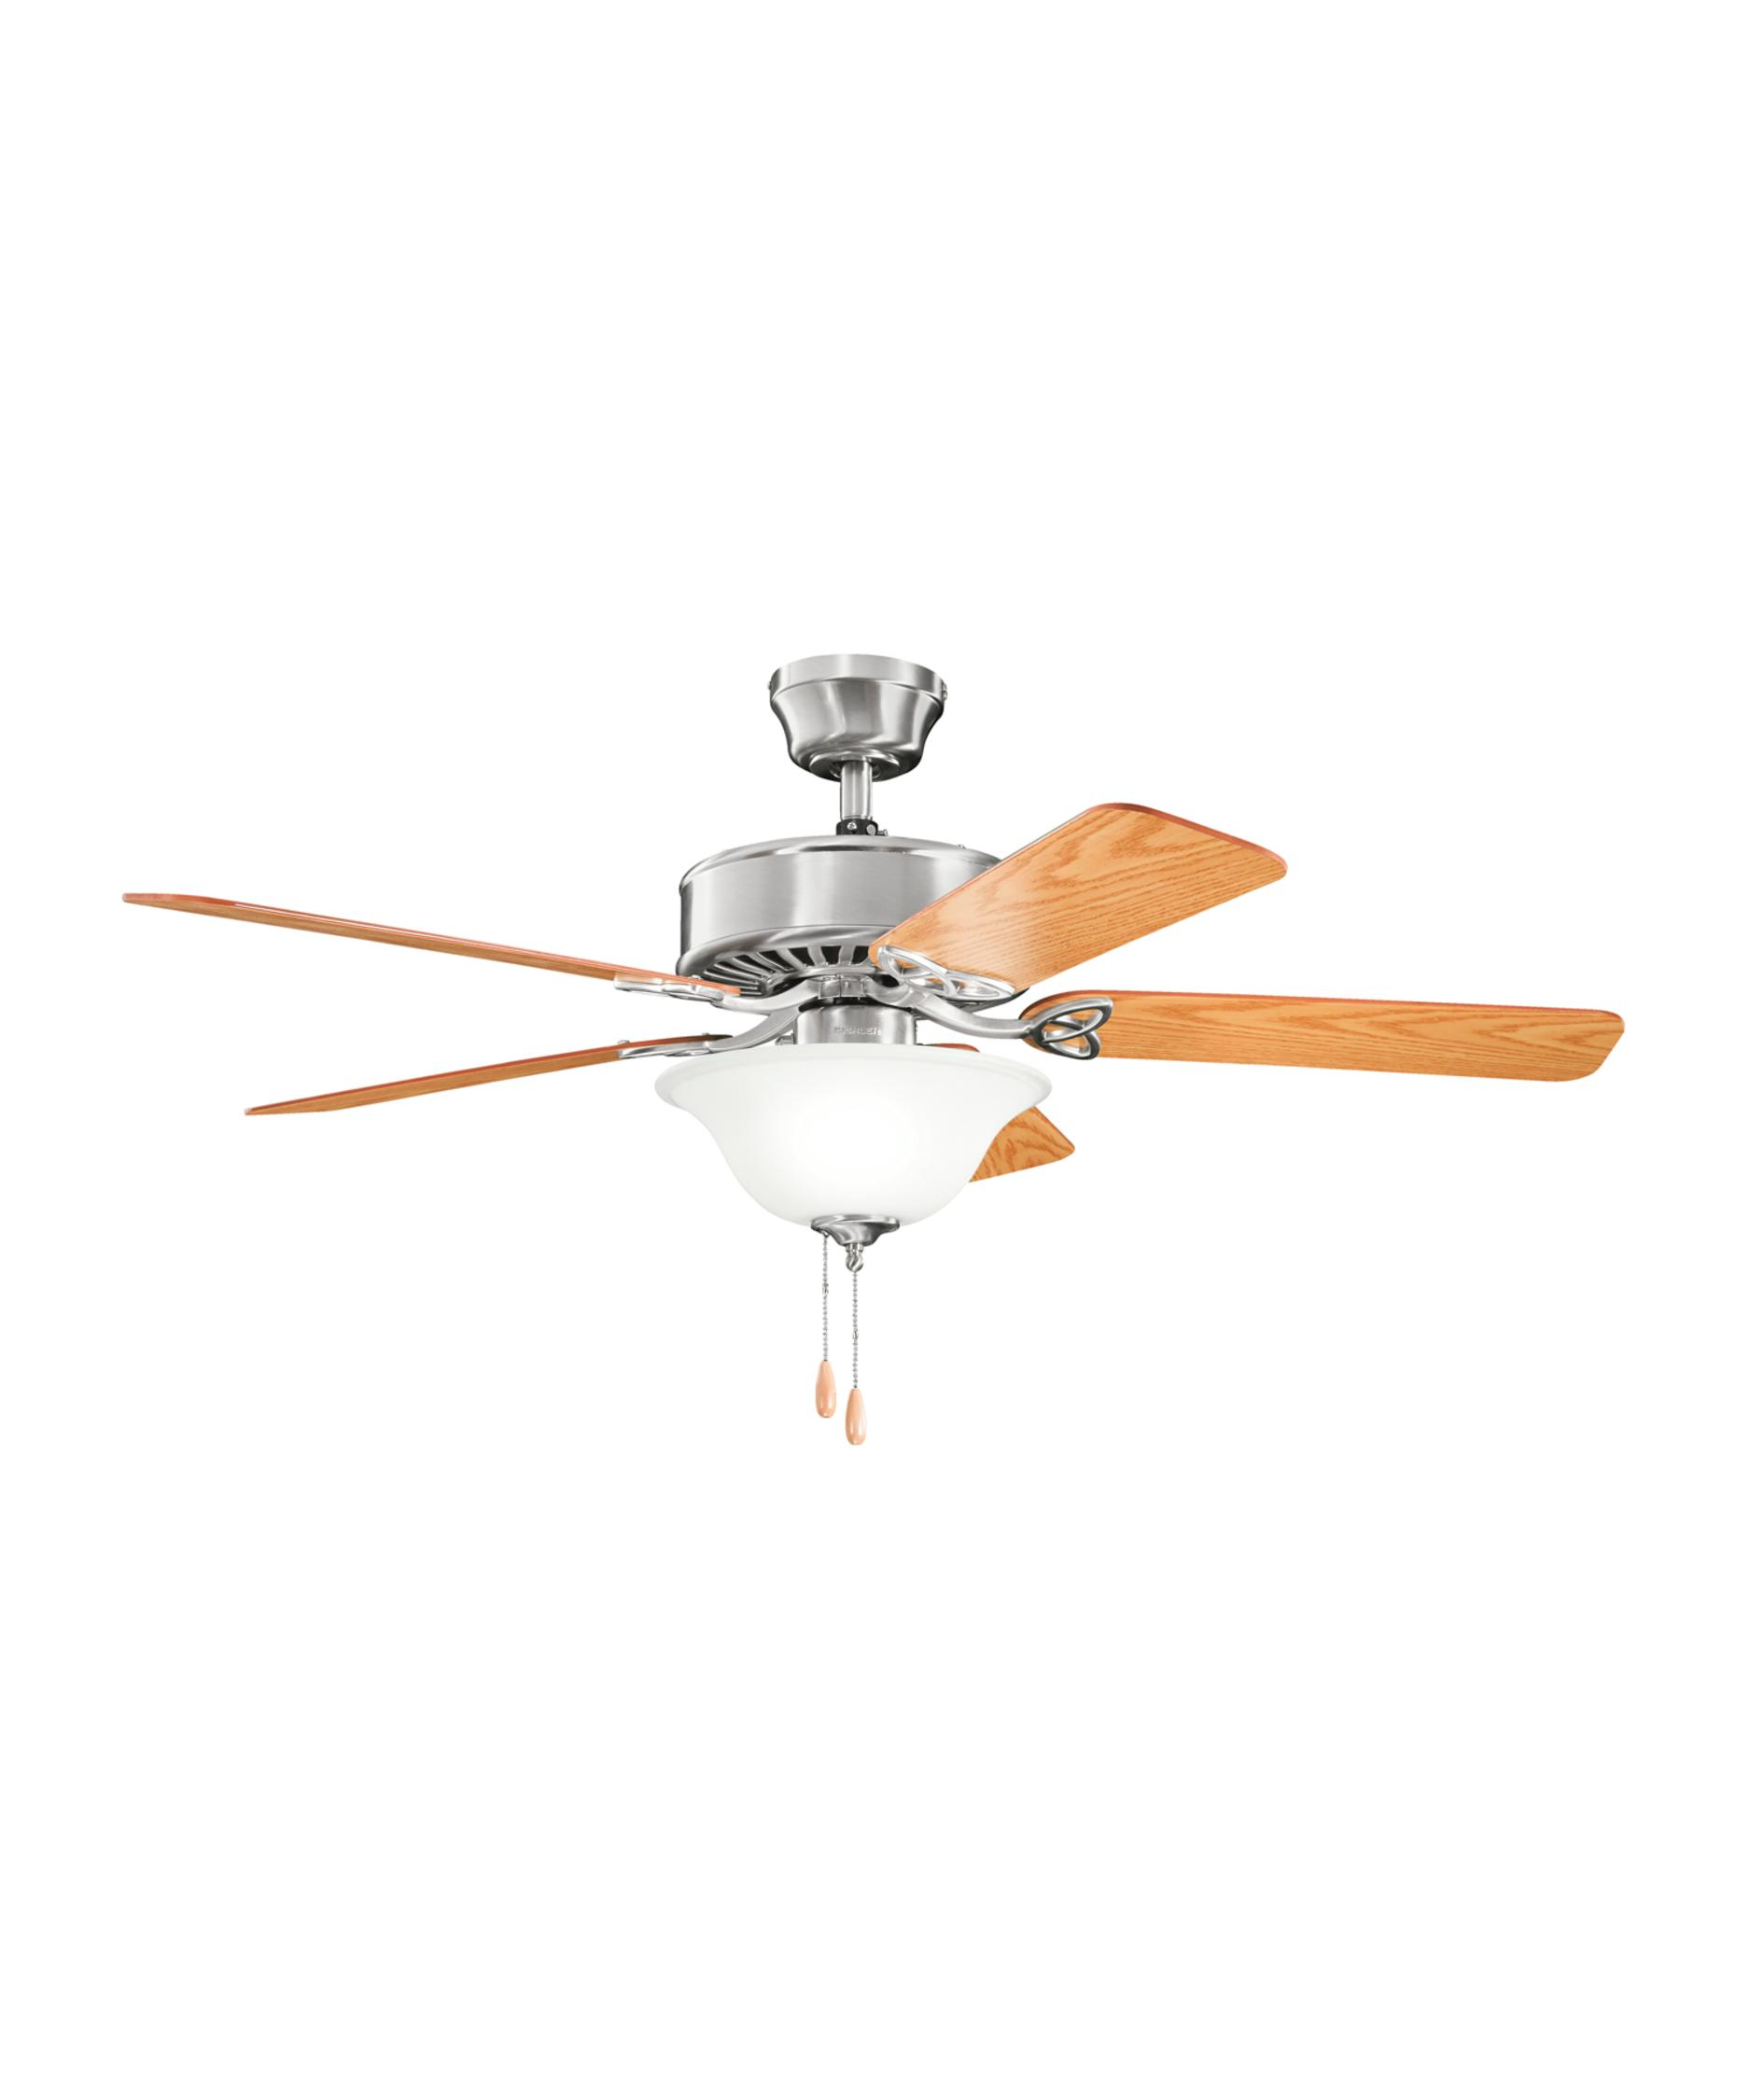 kichler renew select 50 inch 5 blade ceiling fan capitol lighting - Kichler Fans